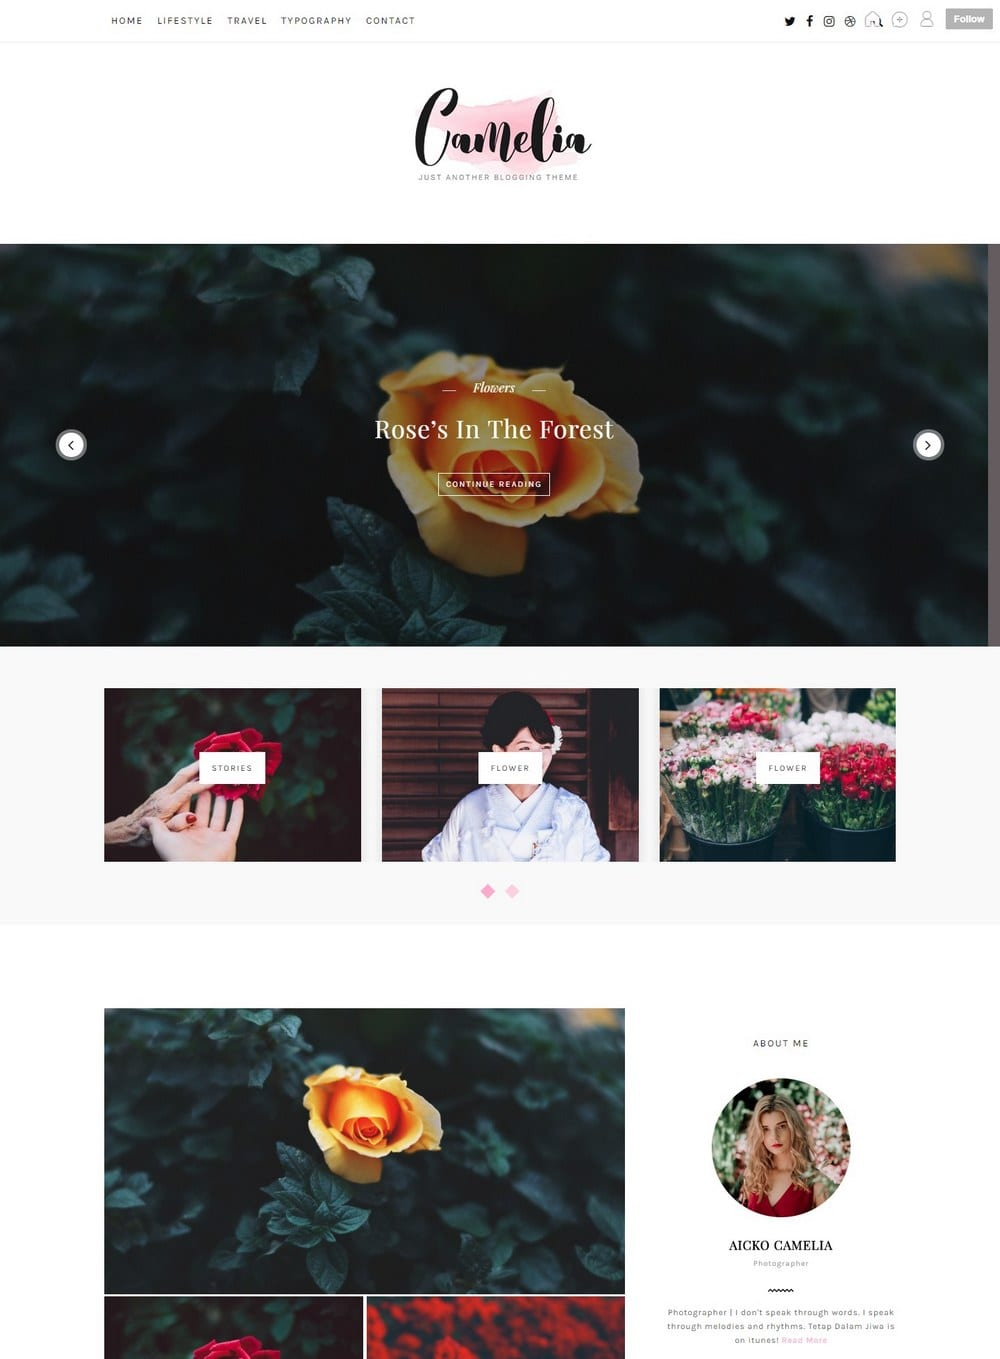 camelia-cute-tumblr-theme